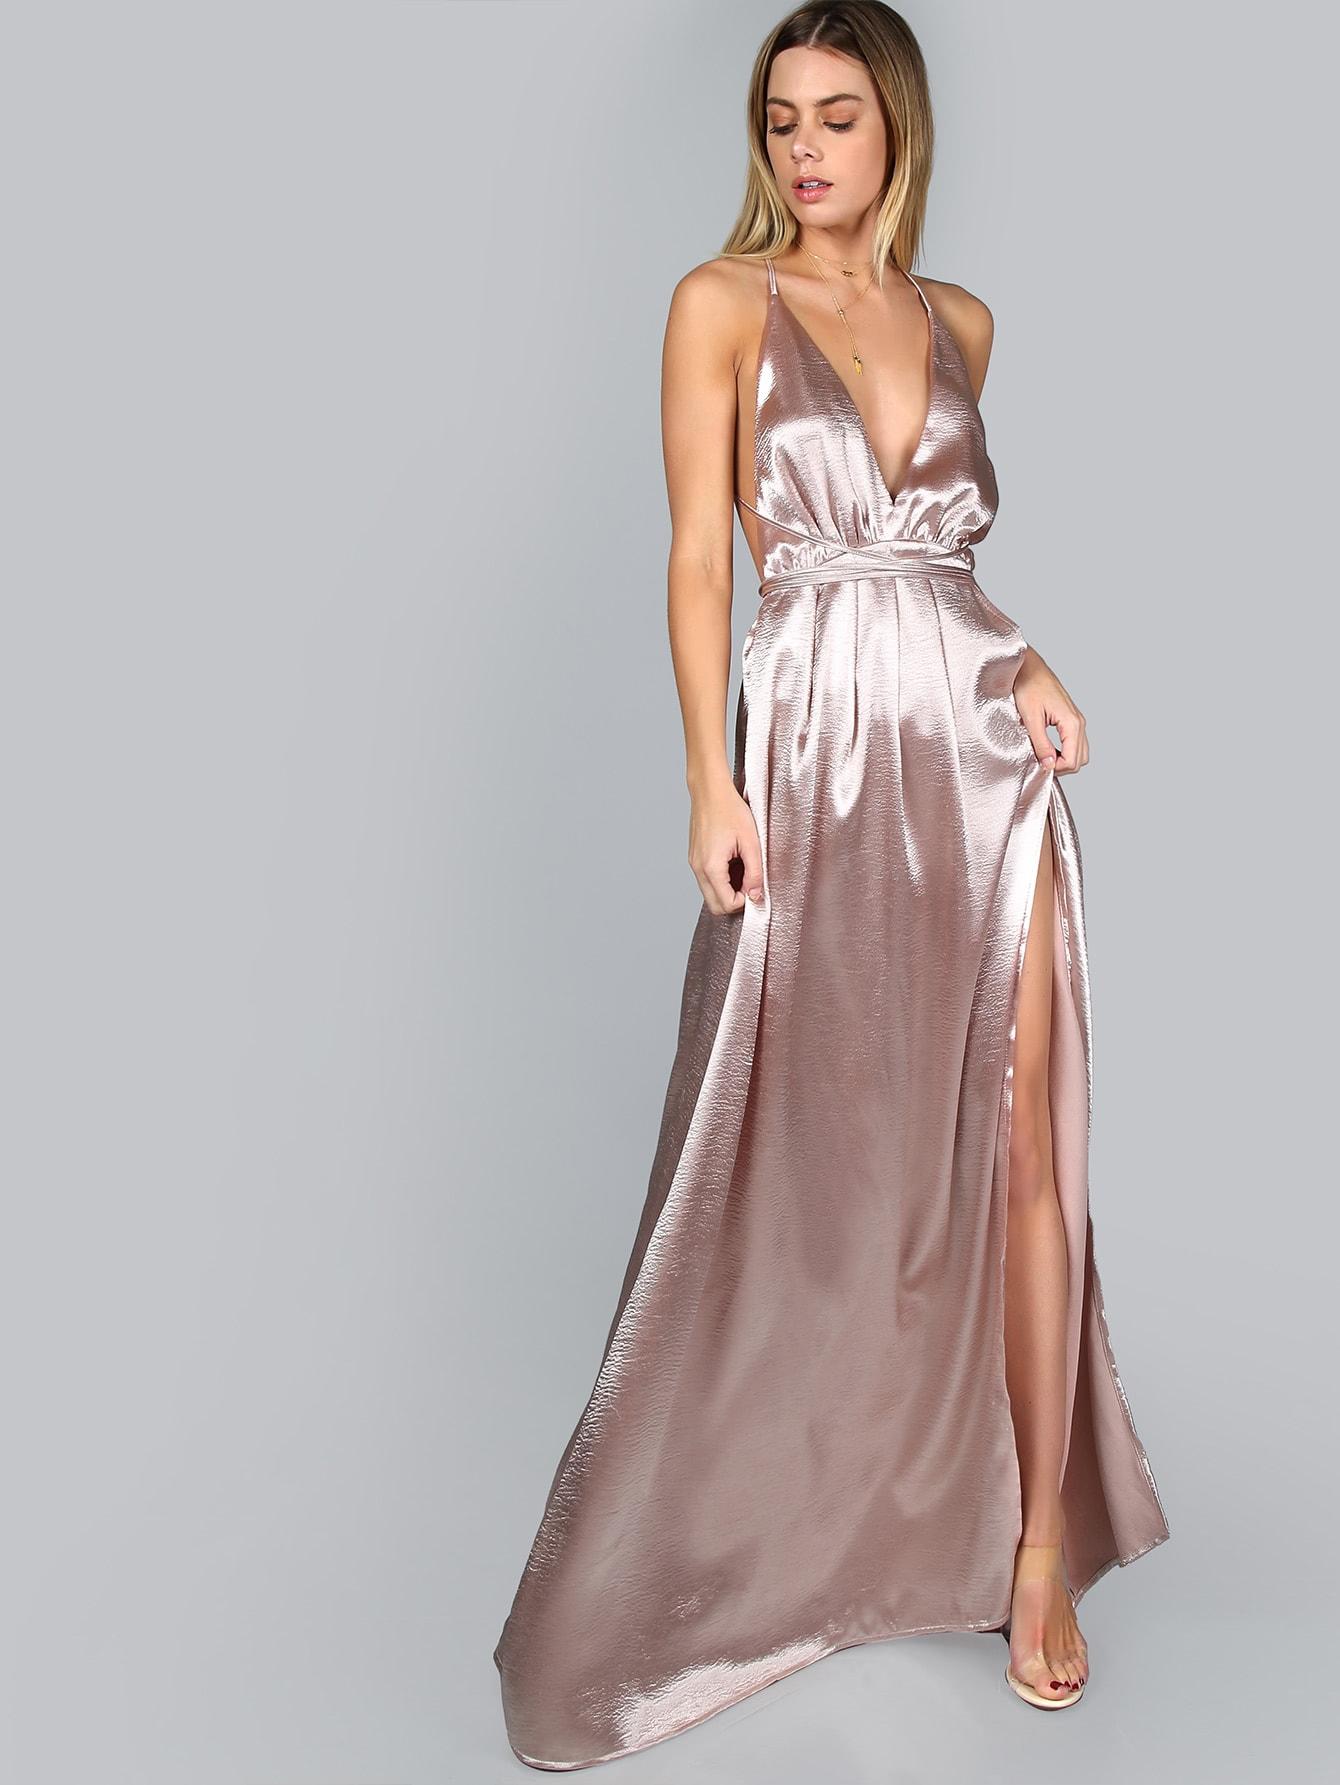 Vestidos nochevieja baratos madrid